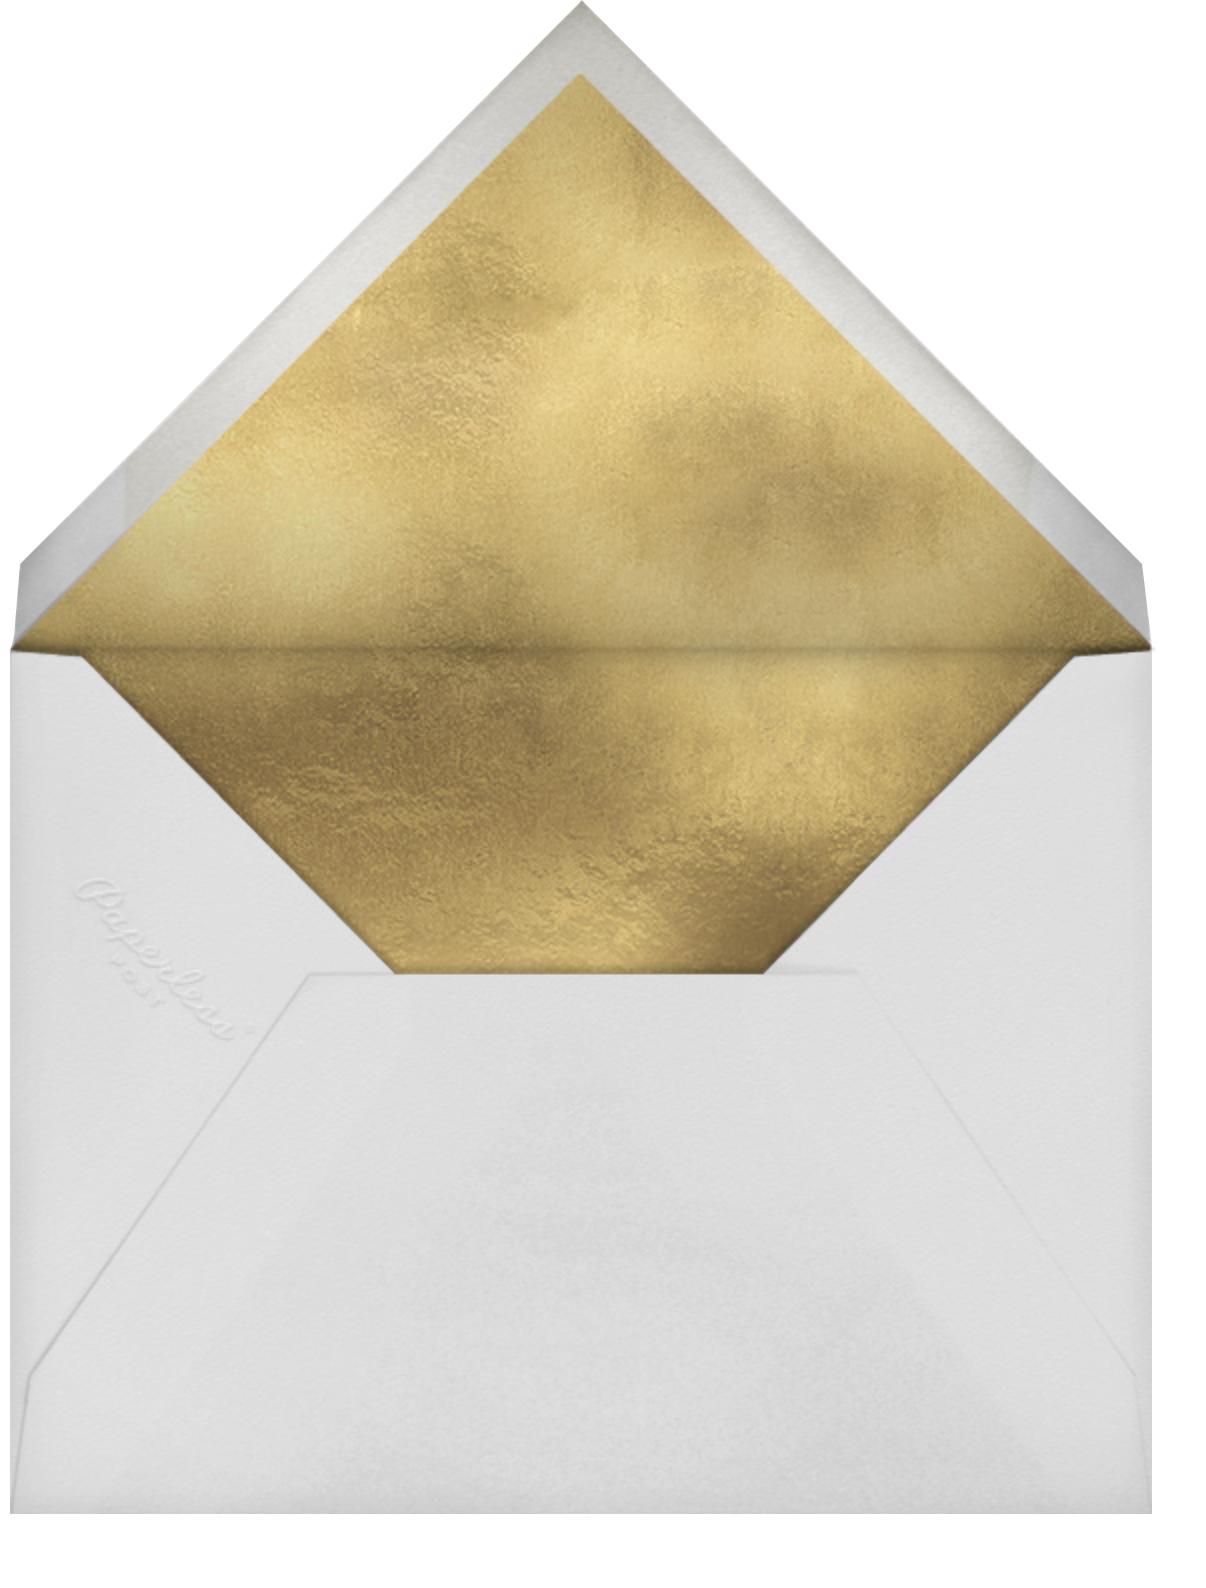 Striped Tulips - White - Oscar de la Renta - Brunch - envelope back